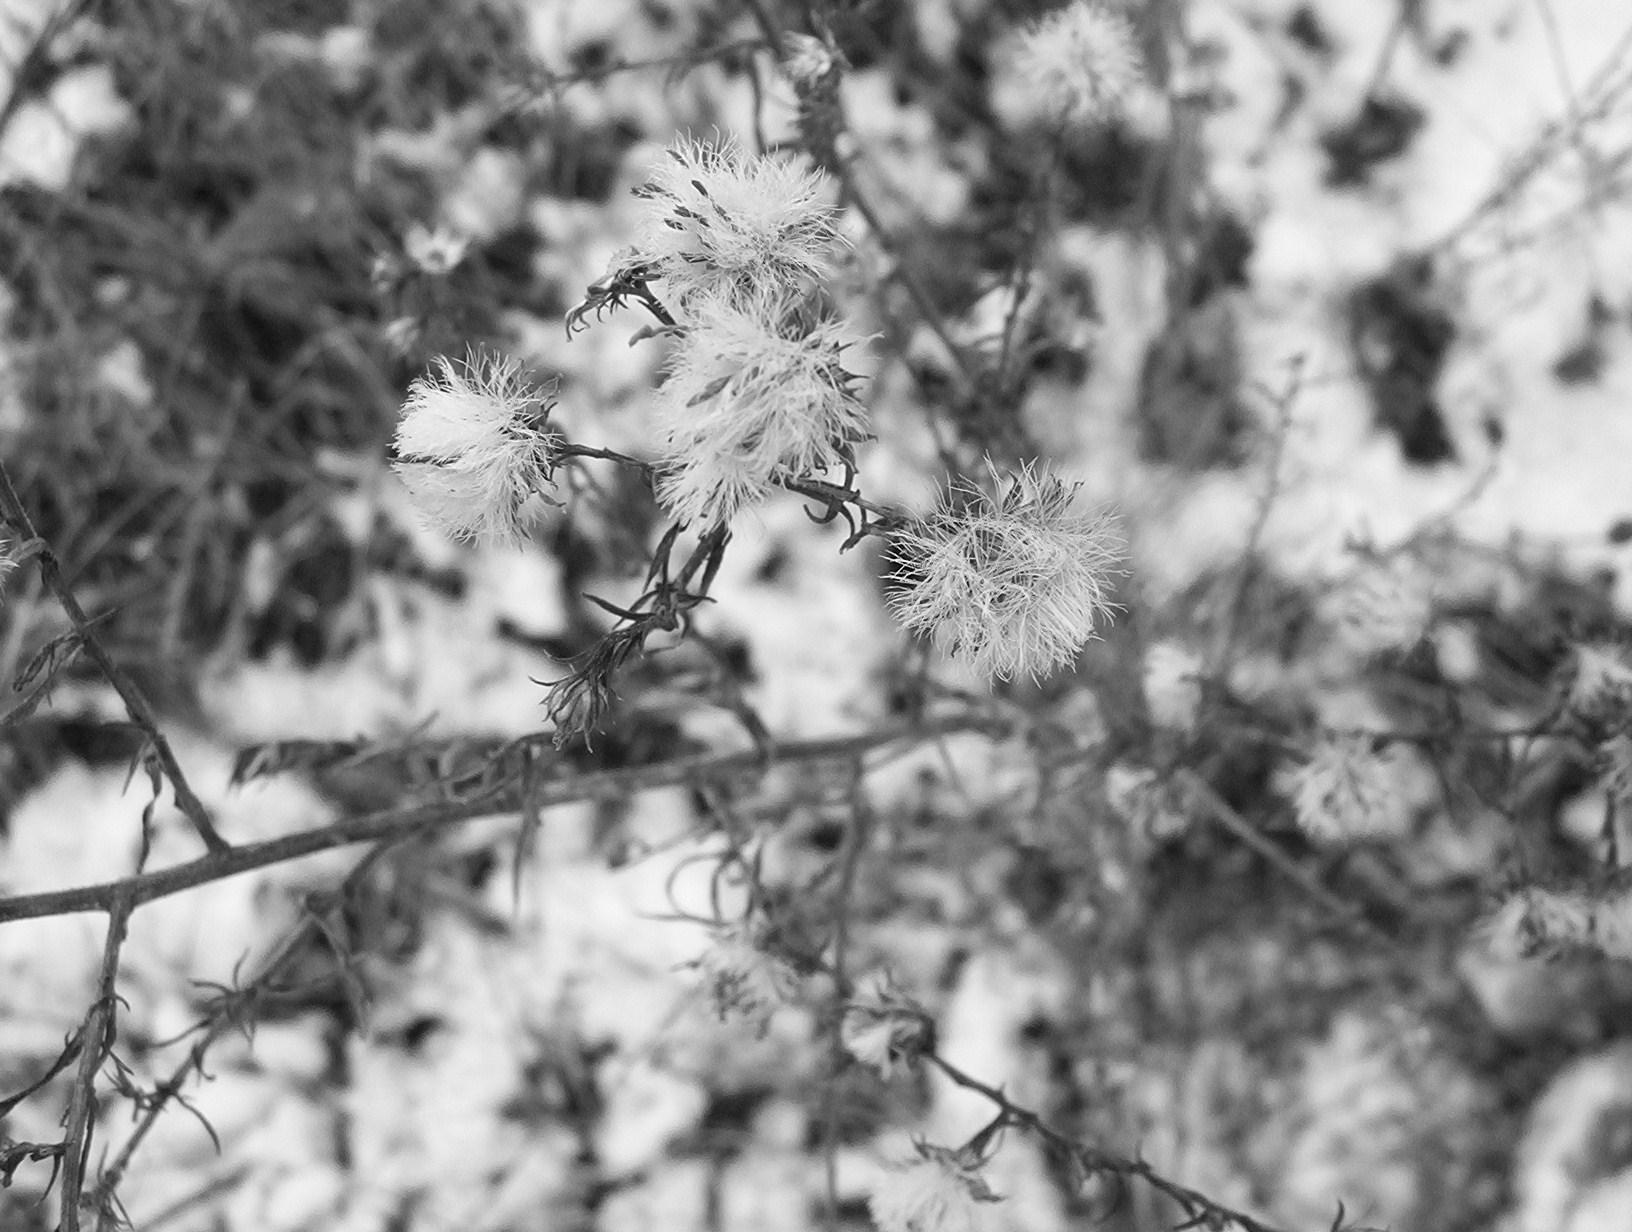 Weeds, monochrome